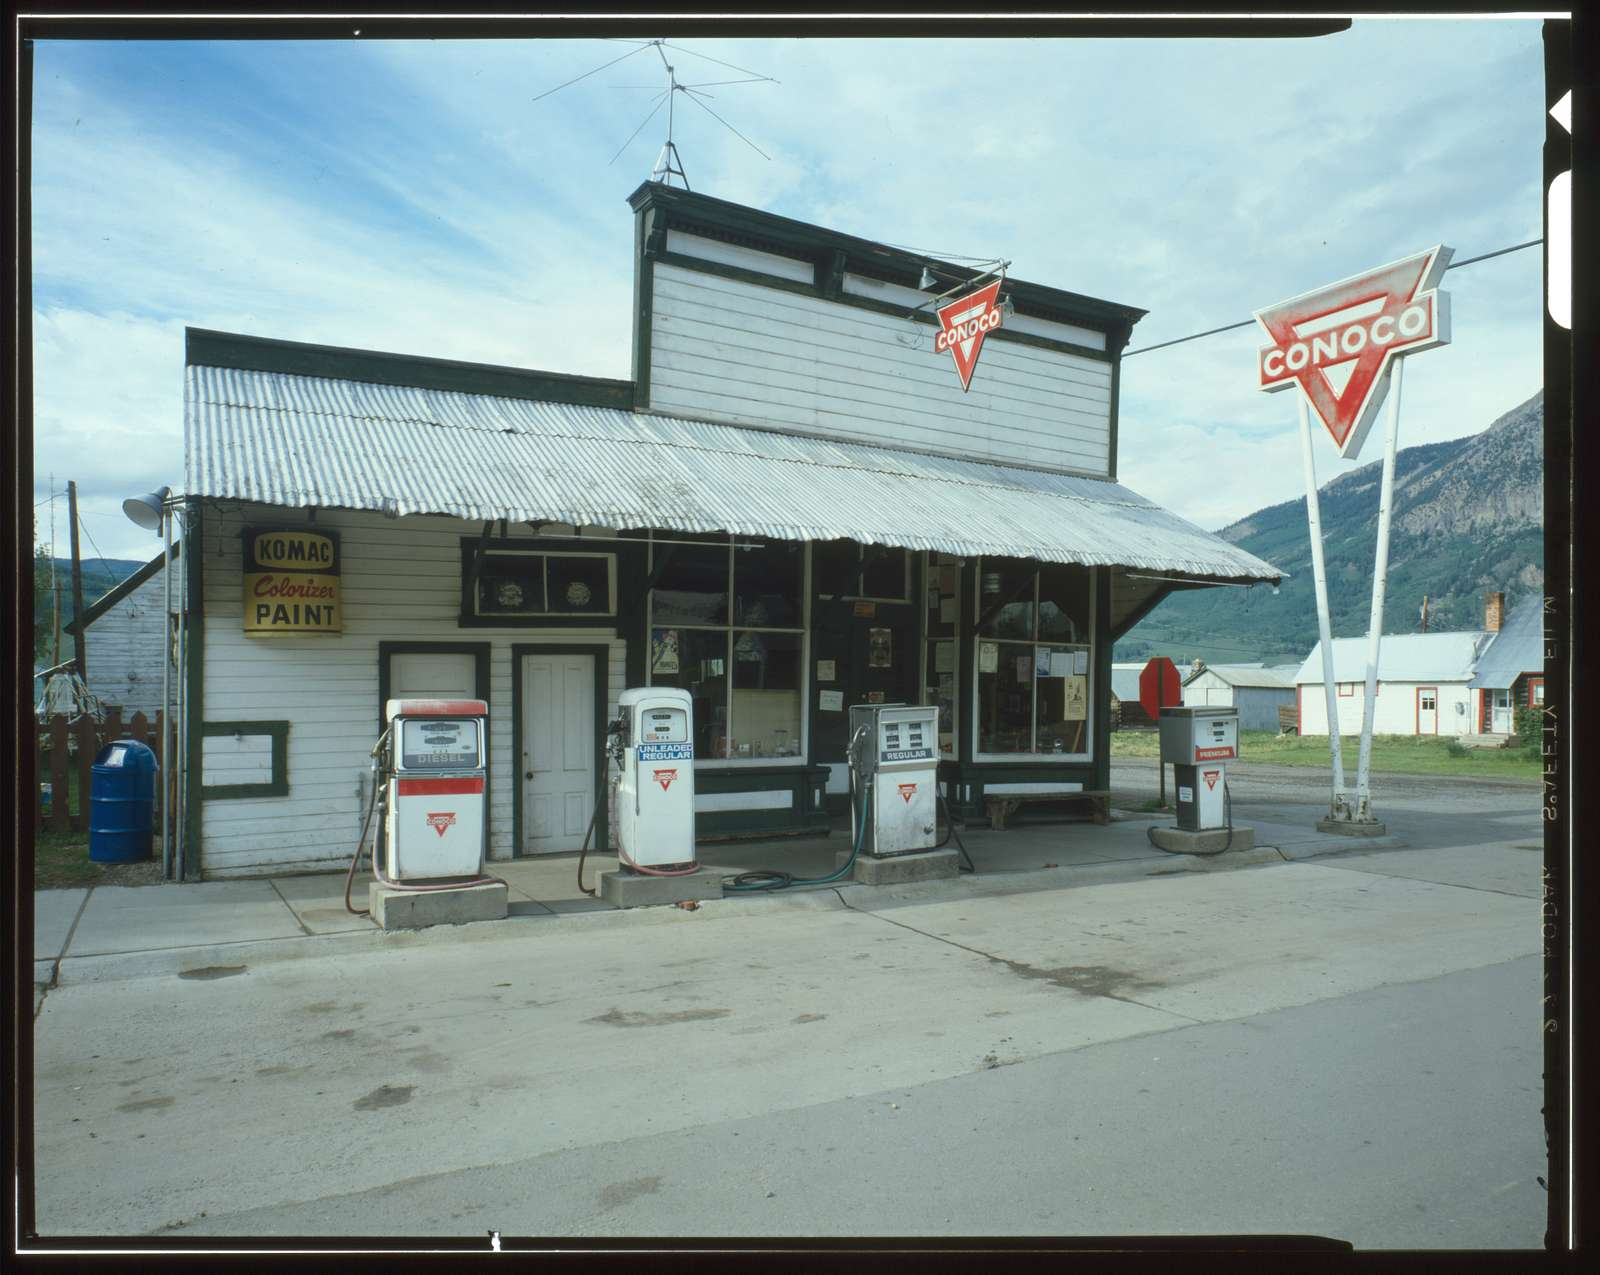 Tony's Conoco Service Station, Elk Avenue, Crested Butte, Gunnison County, CO